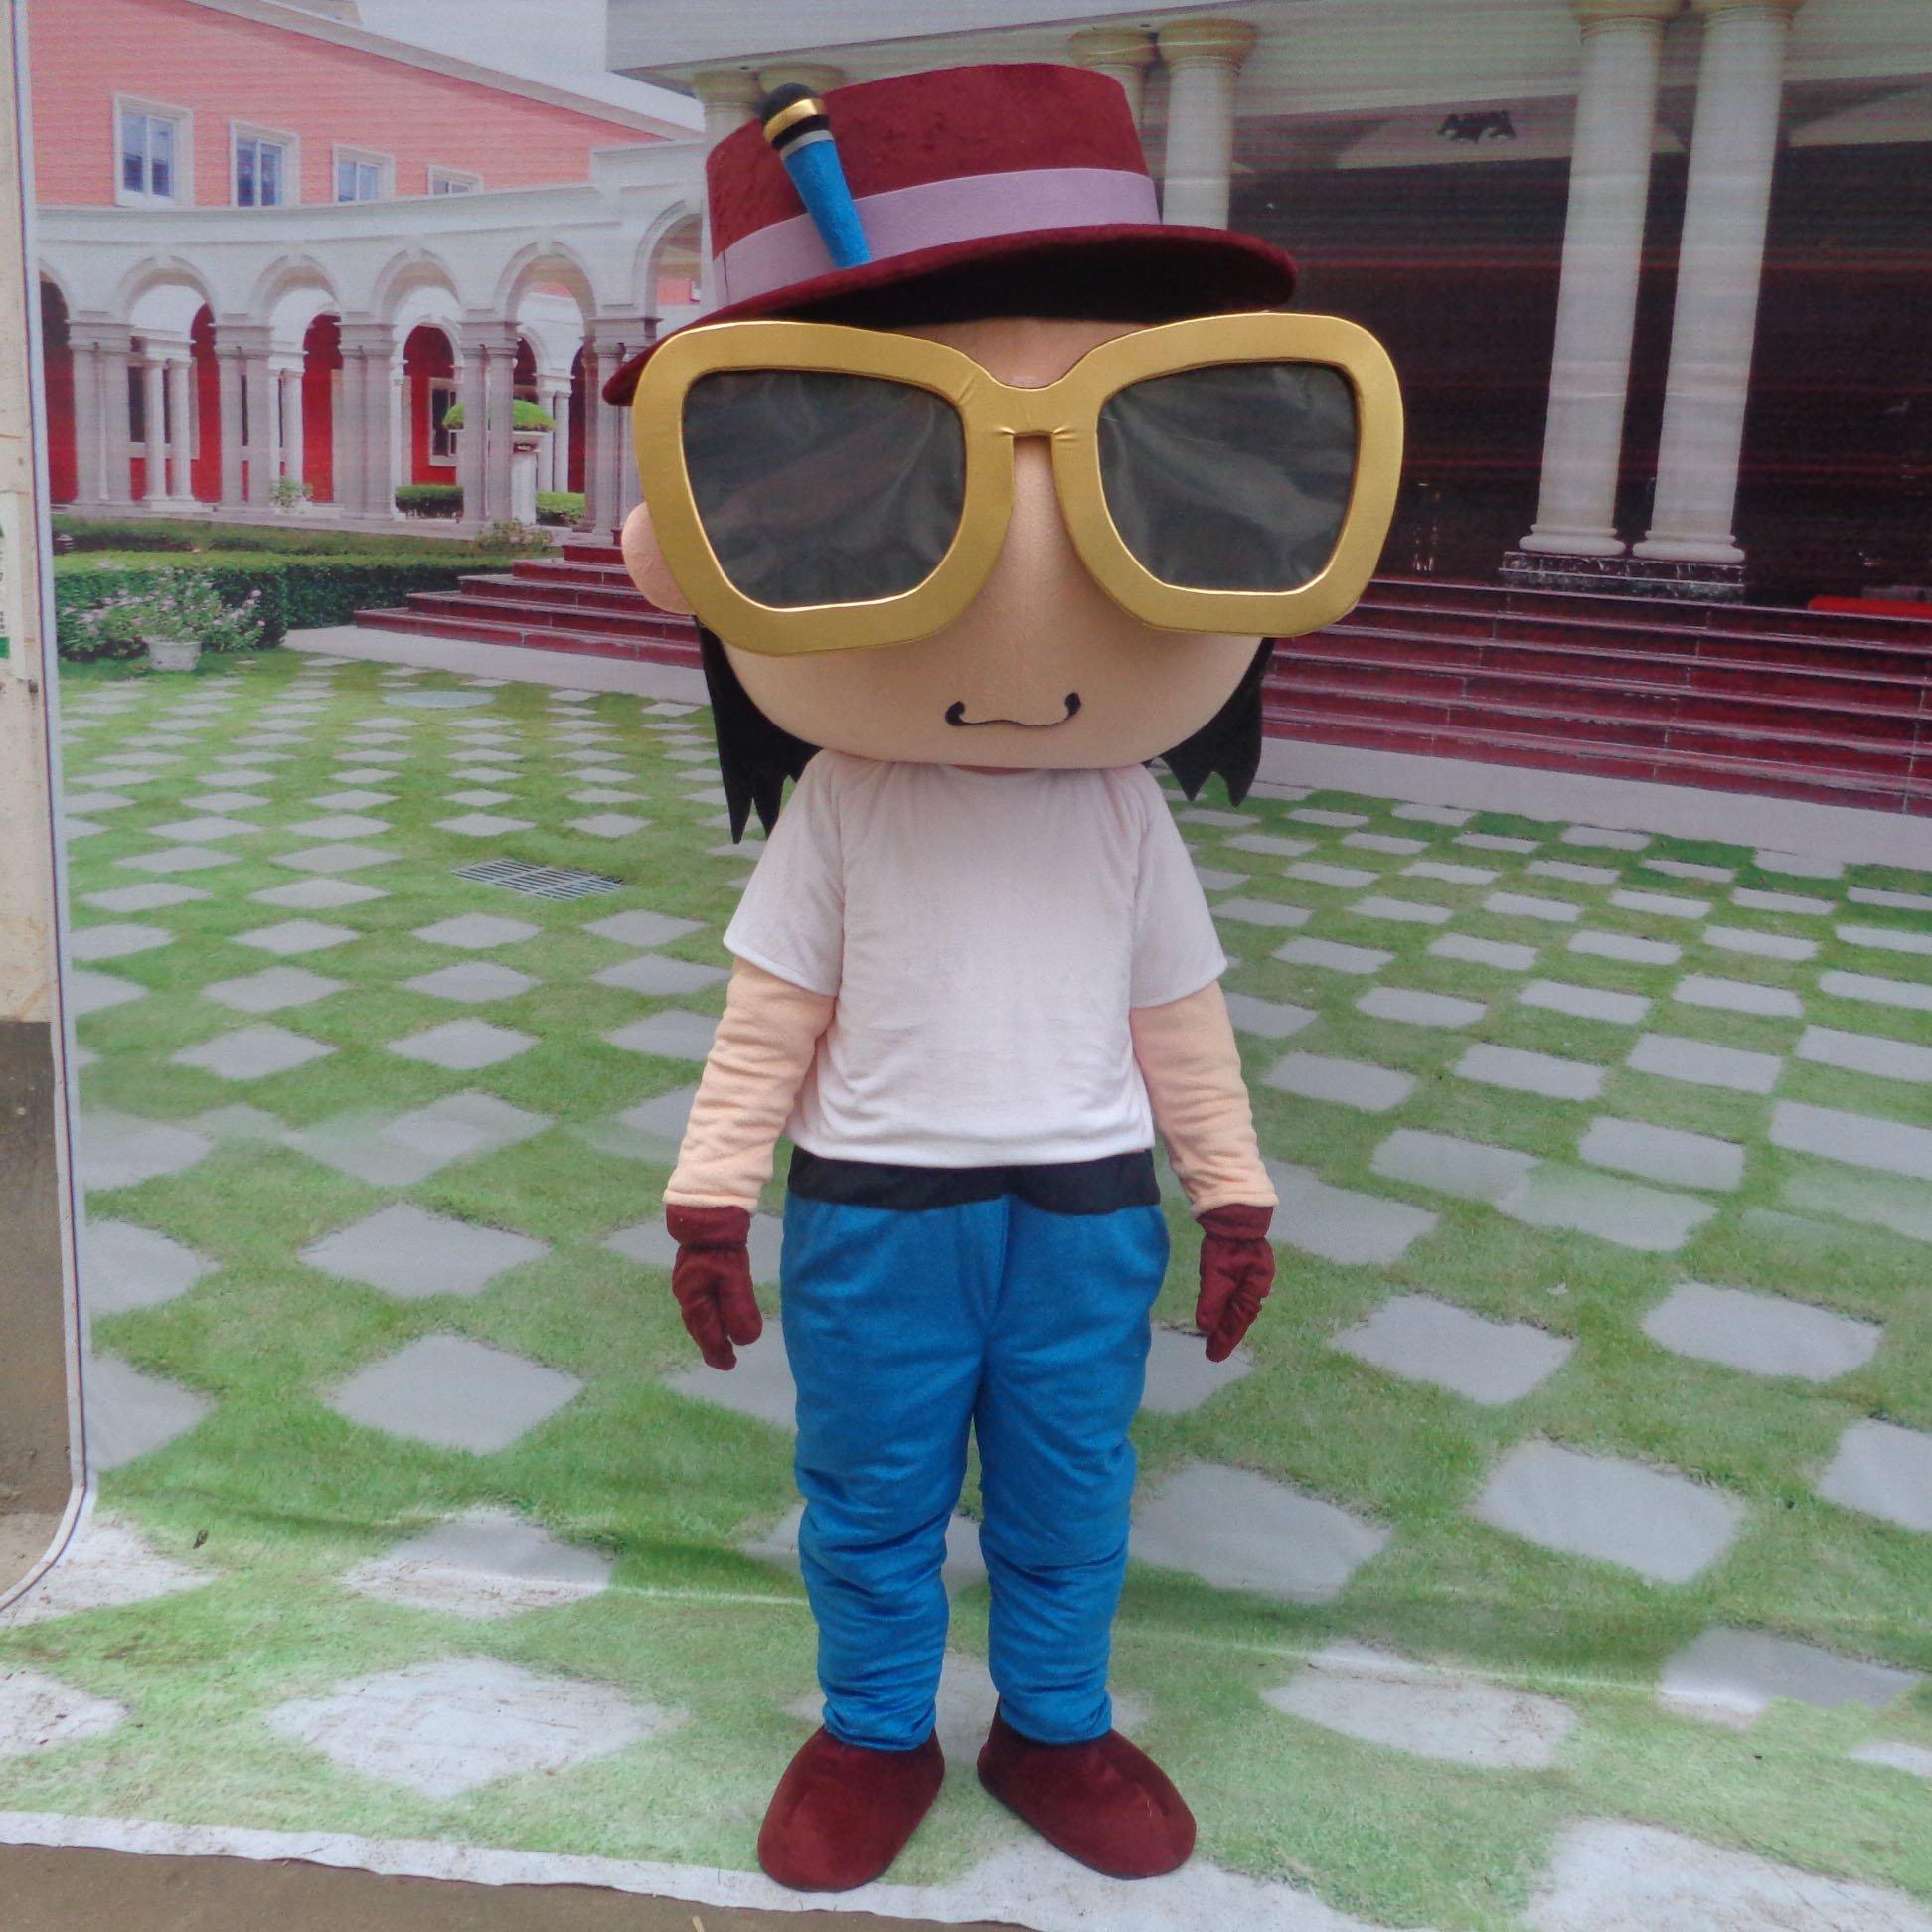 Cartoon Doll Clothing Cartoon Walking Doll Clothing Props Cartoon Character Clothes Doll Dolls Clothing Mascot Costume